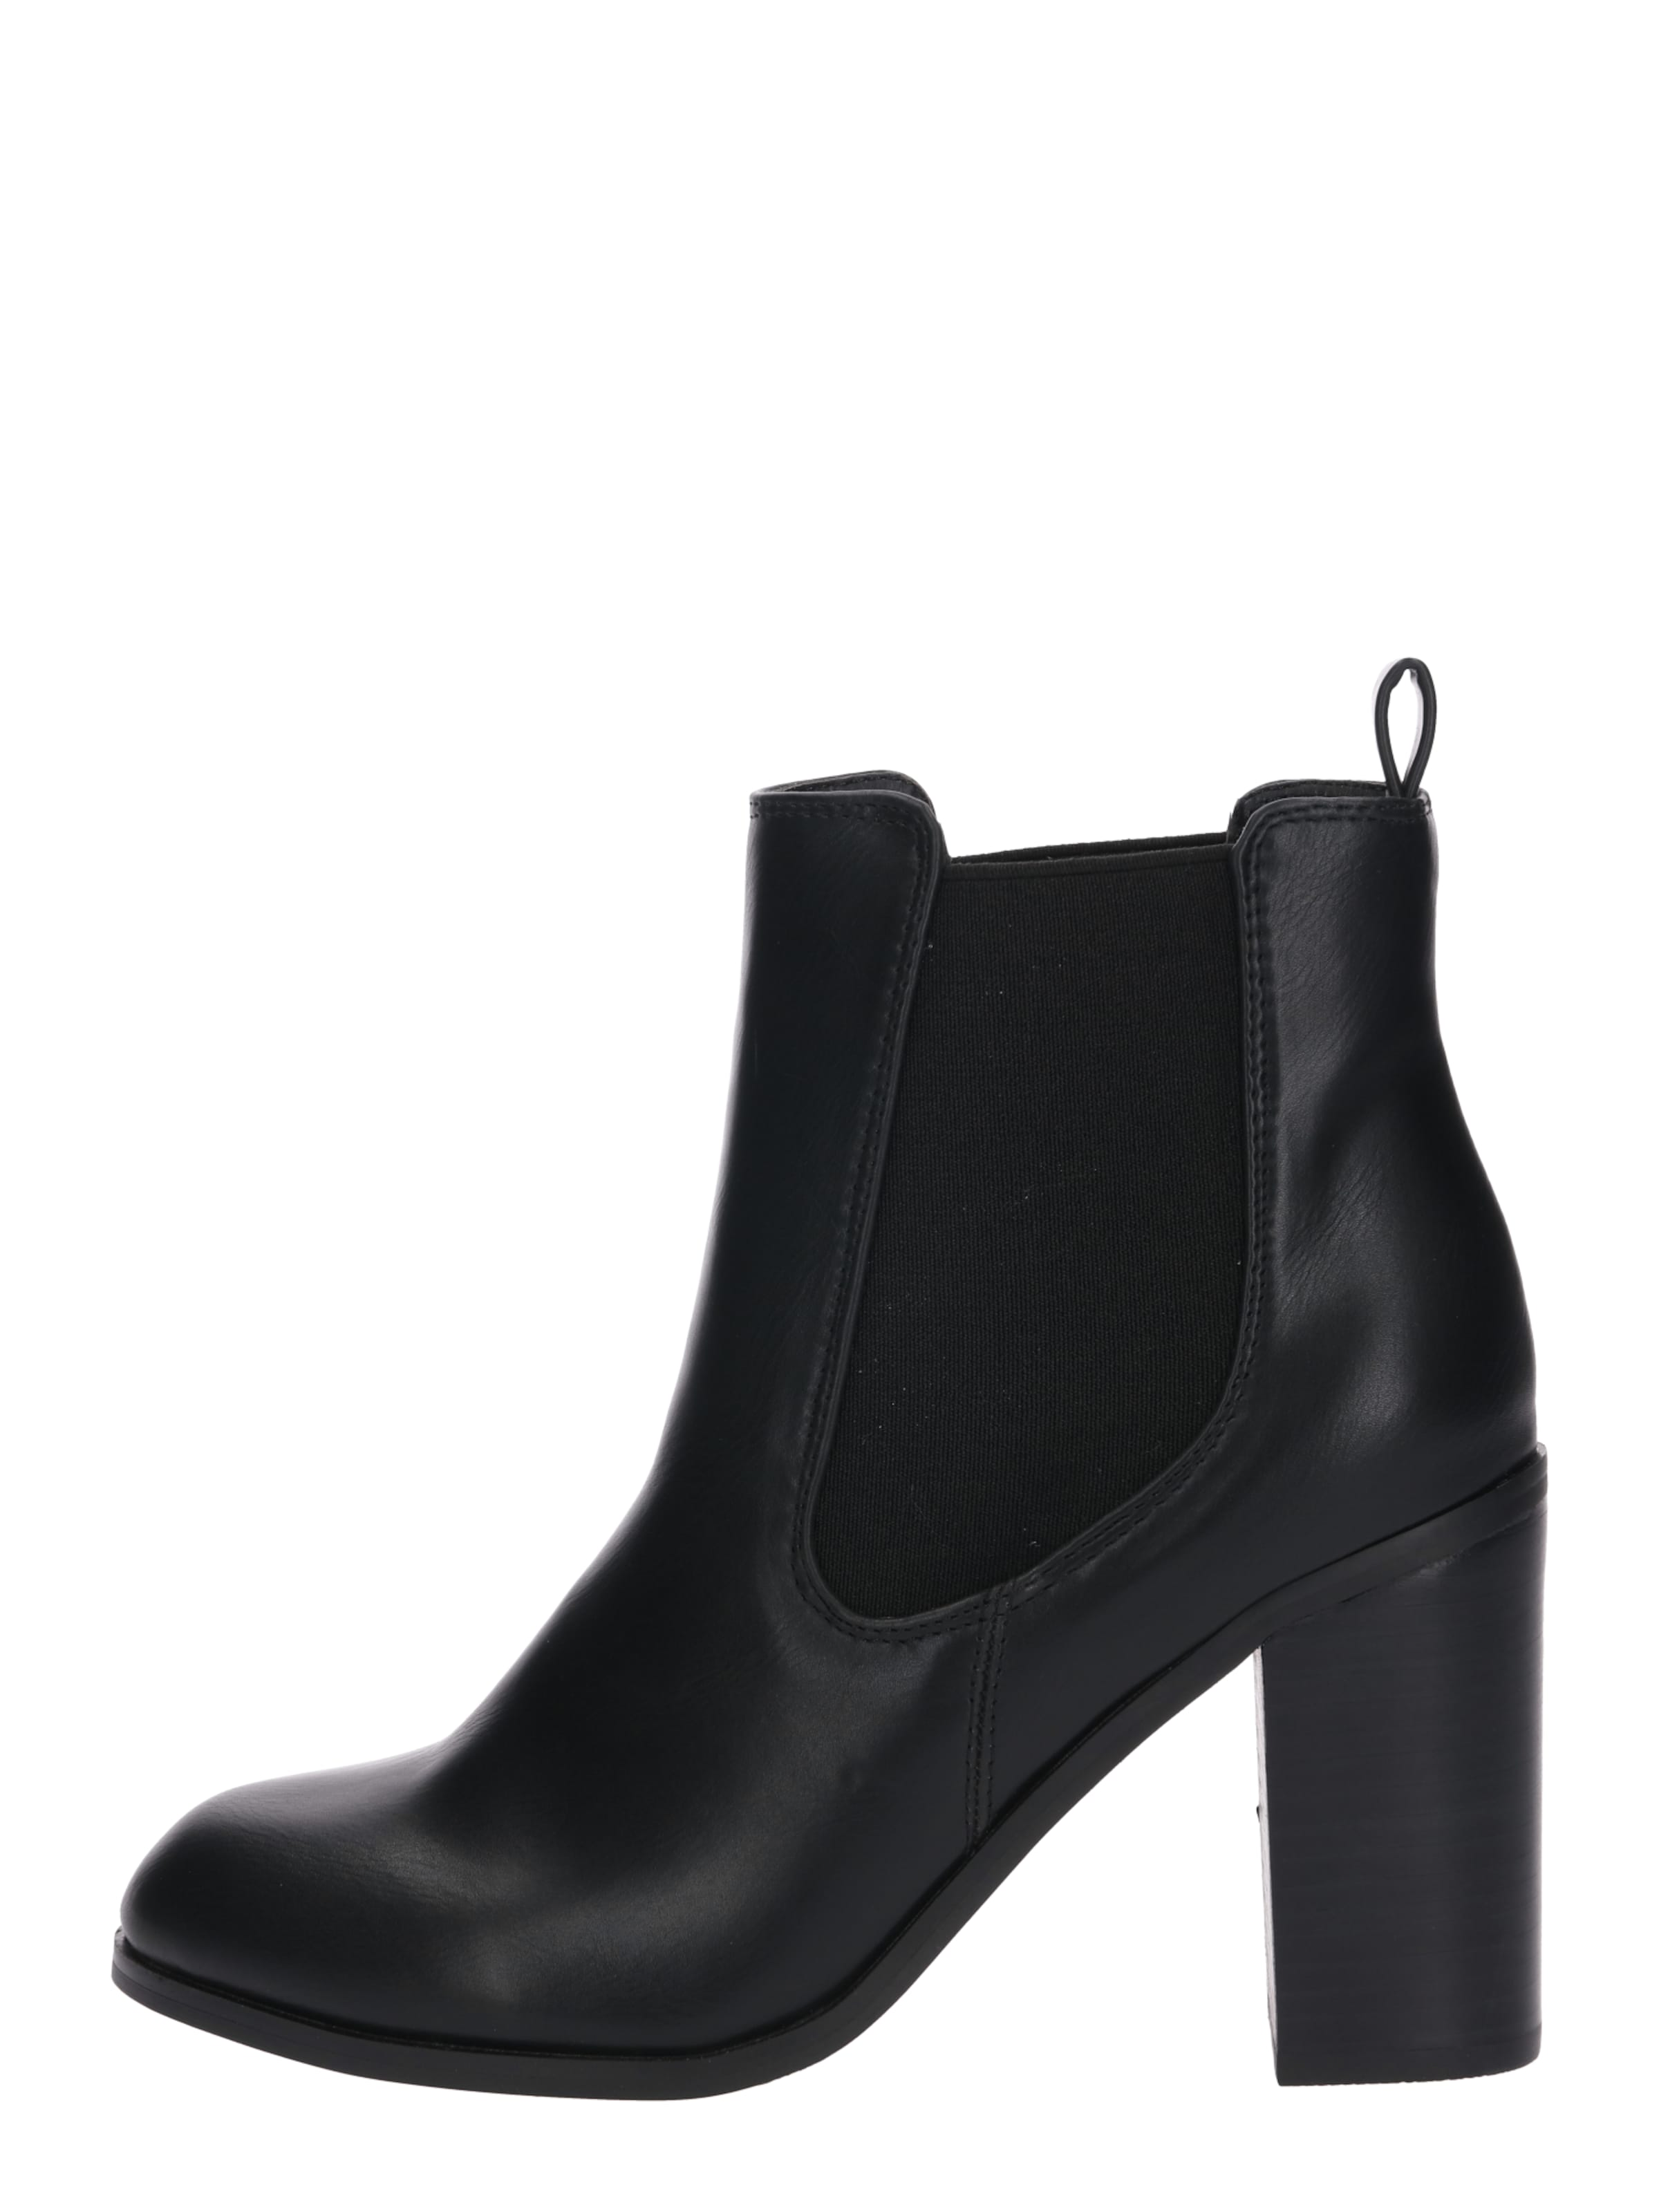 Buffalo Chelsea Boots Noir En En Boots Buffalo Chelsea Noir qVpGjSULMz